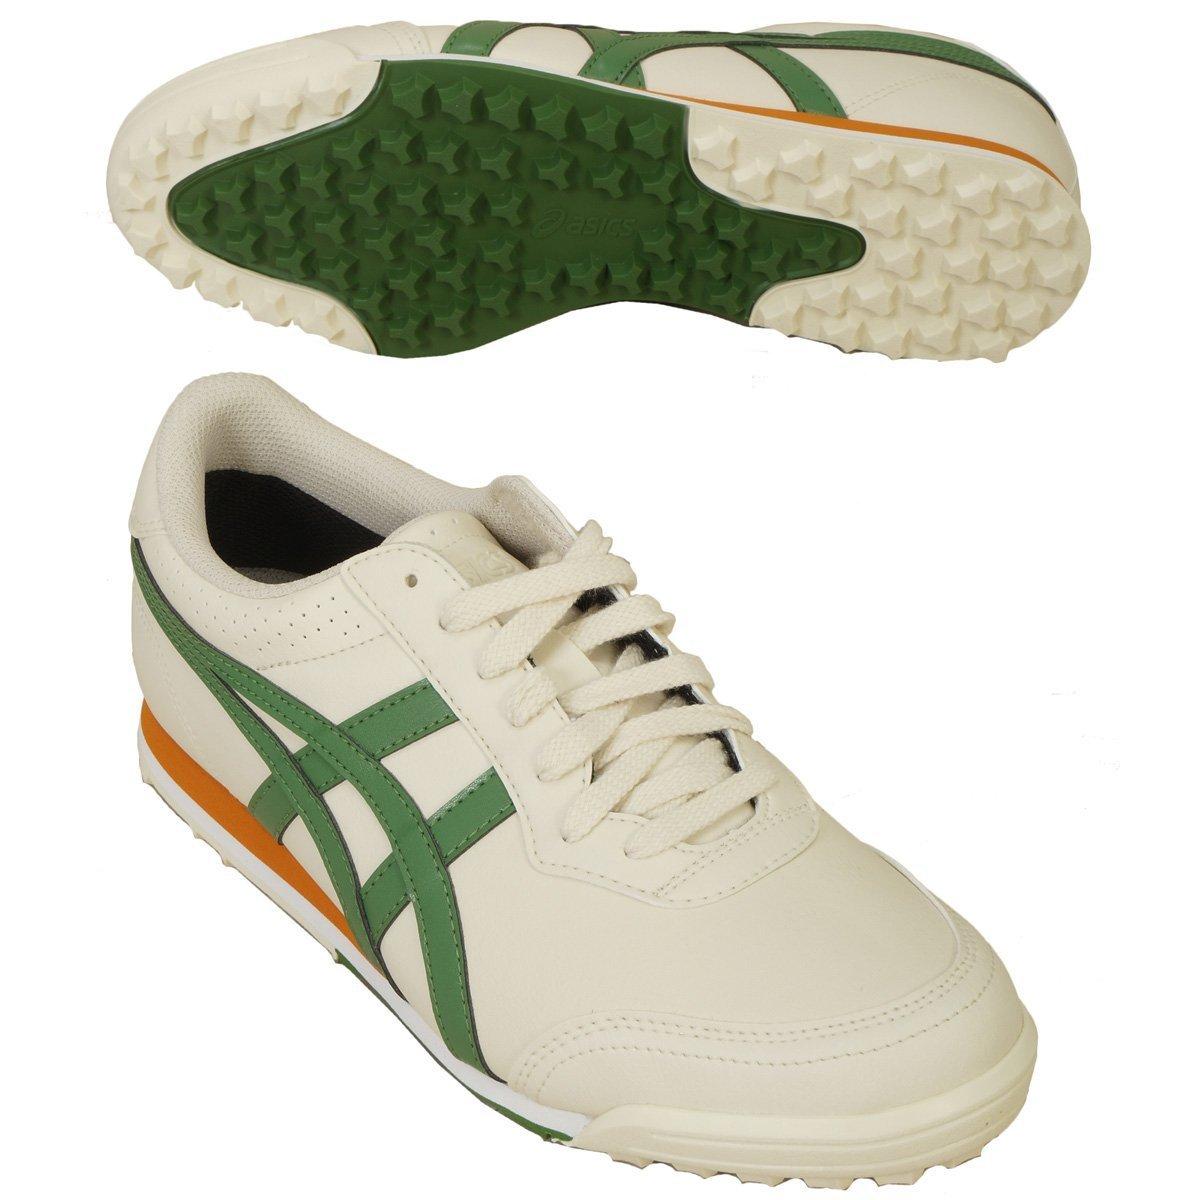 asics(アシックス) ゲルプレショット クラシック2 ゴルフシューズ TGN915 B01CUPVC36 26.5cm アイボリー/ダークグリーン